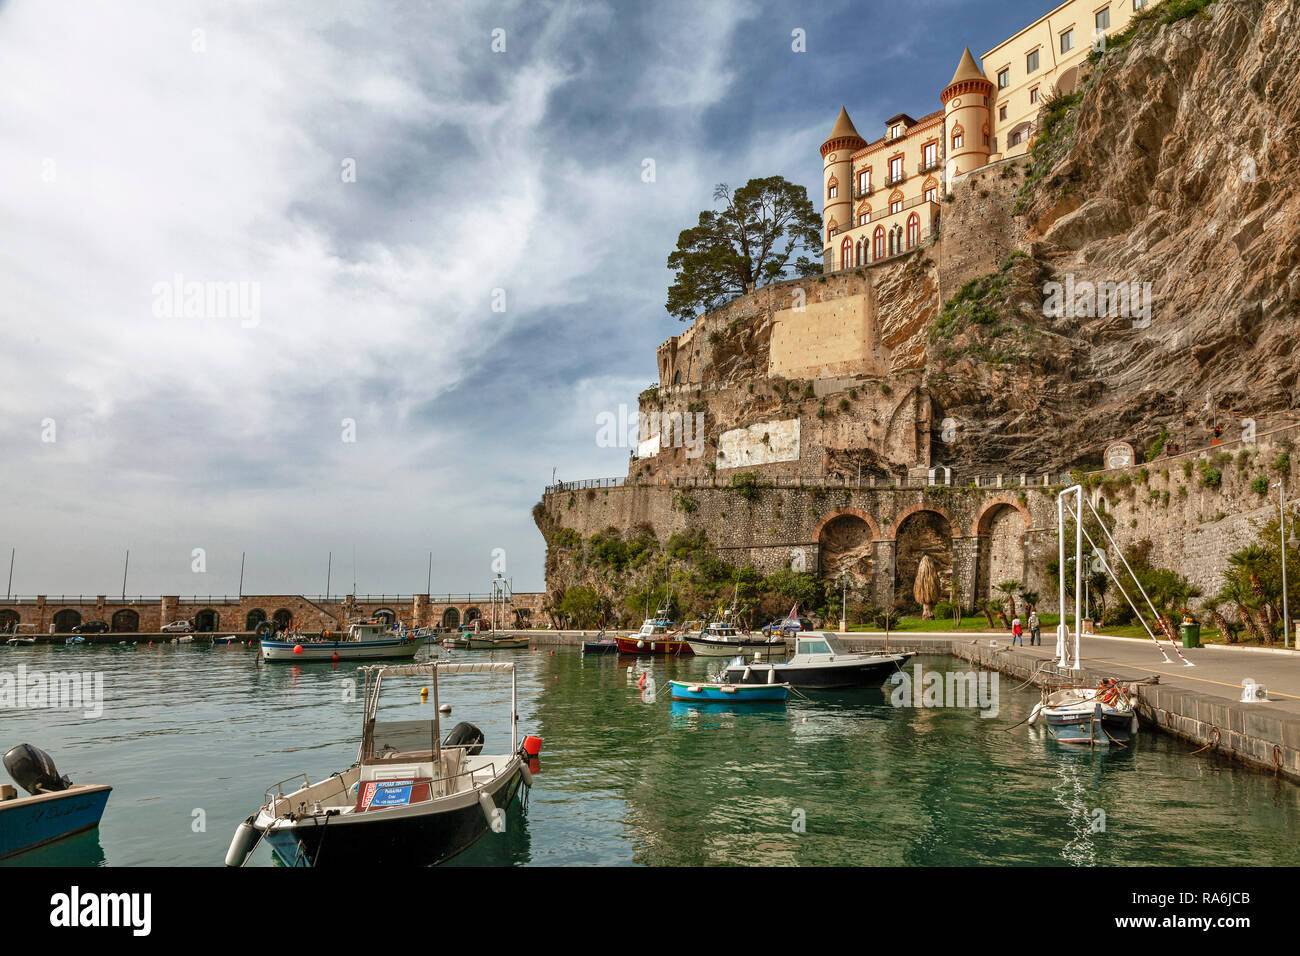 Hafen mit Pazzo Mezzacapo, Maiori, Amalfi Küste, Provinz Salerno, Kampanien, Italien - Stock Image